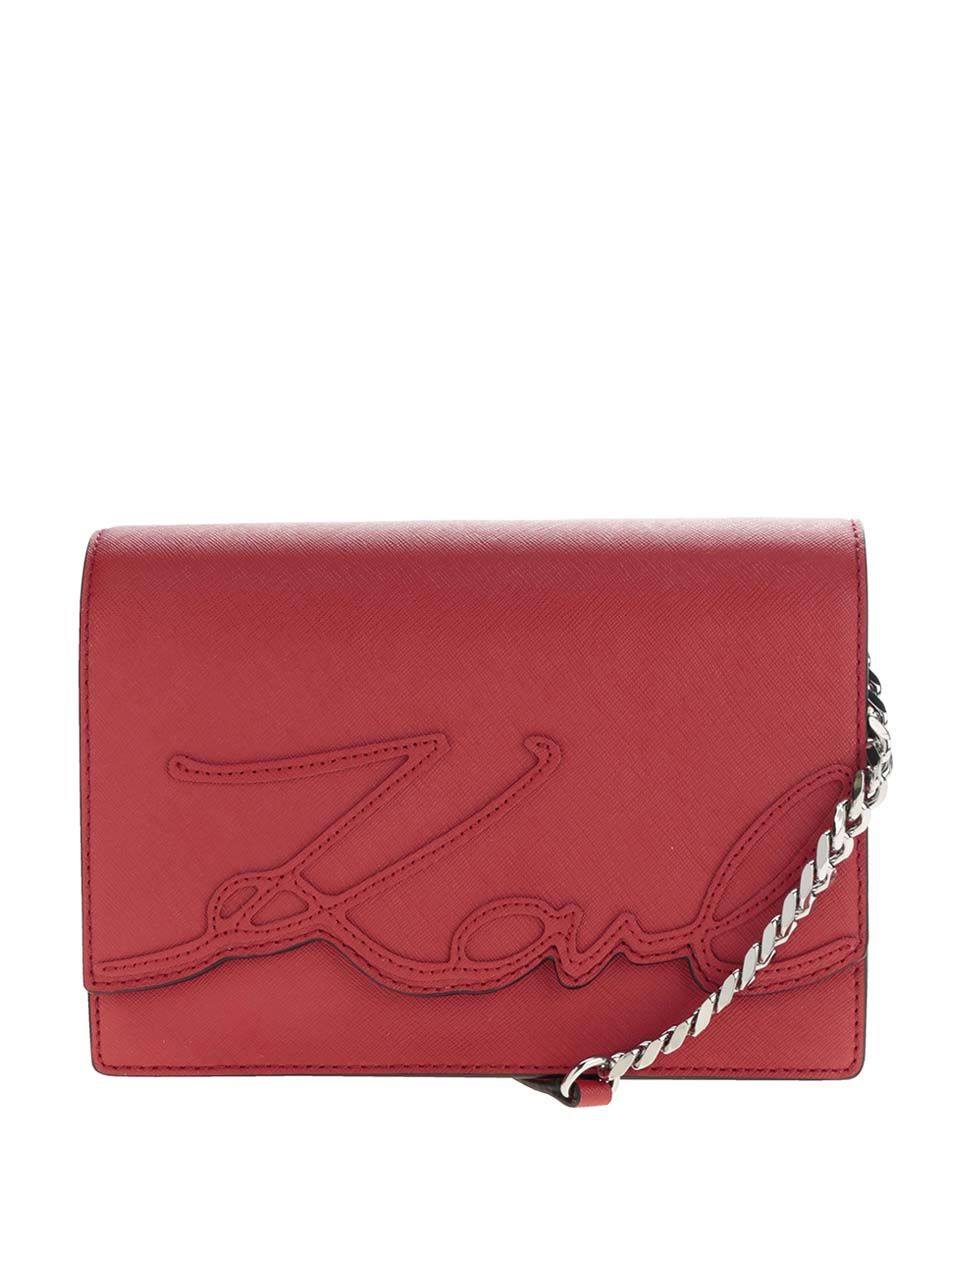 Červená kožená crossbody kabelka KARL LAGERFELD  796dec39d6f